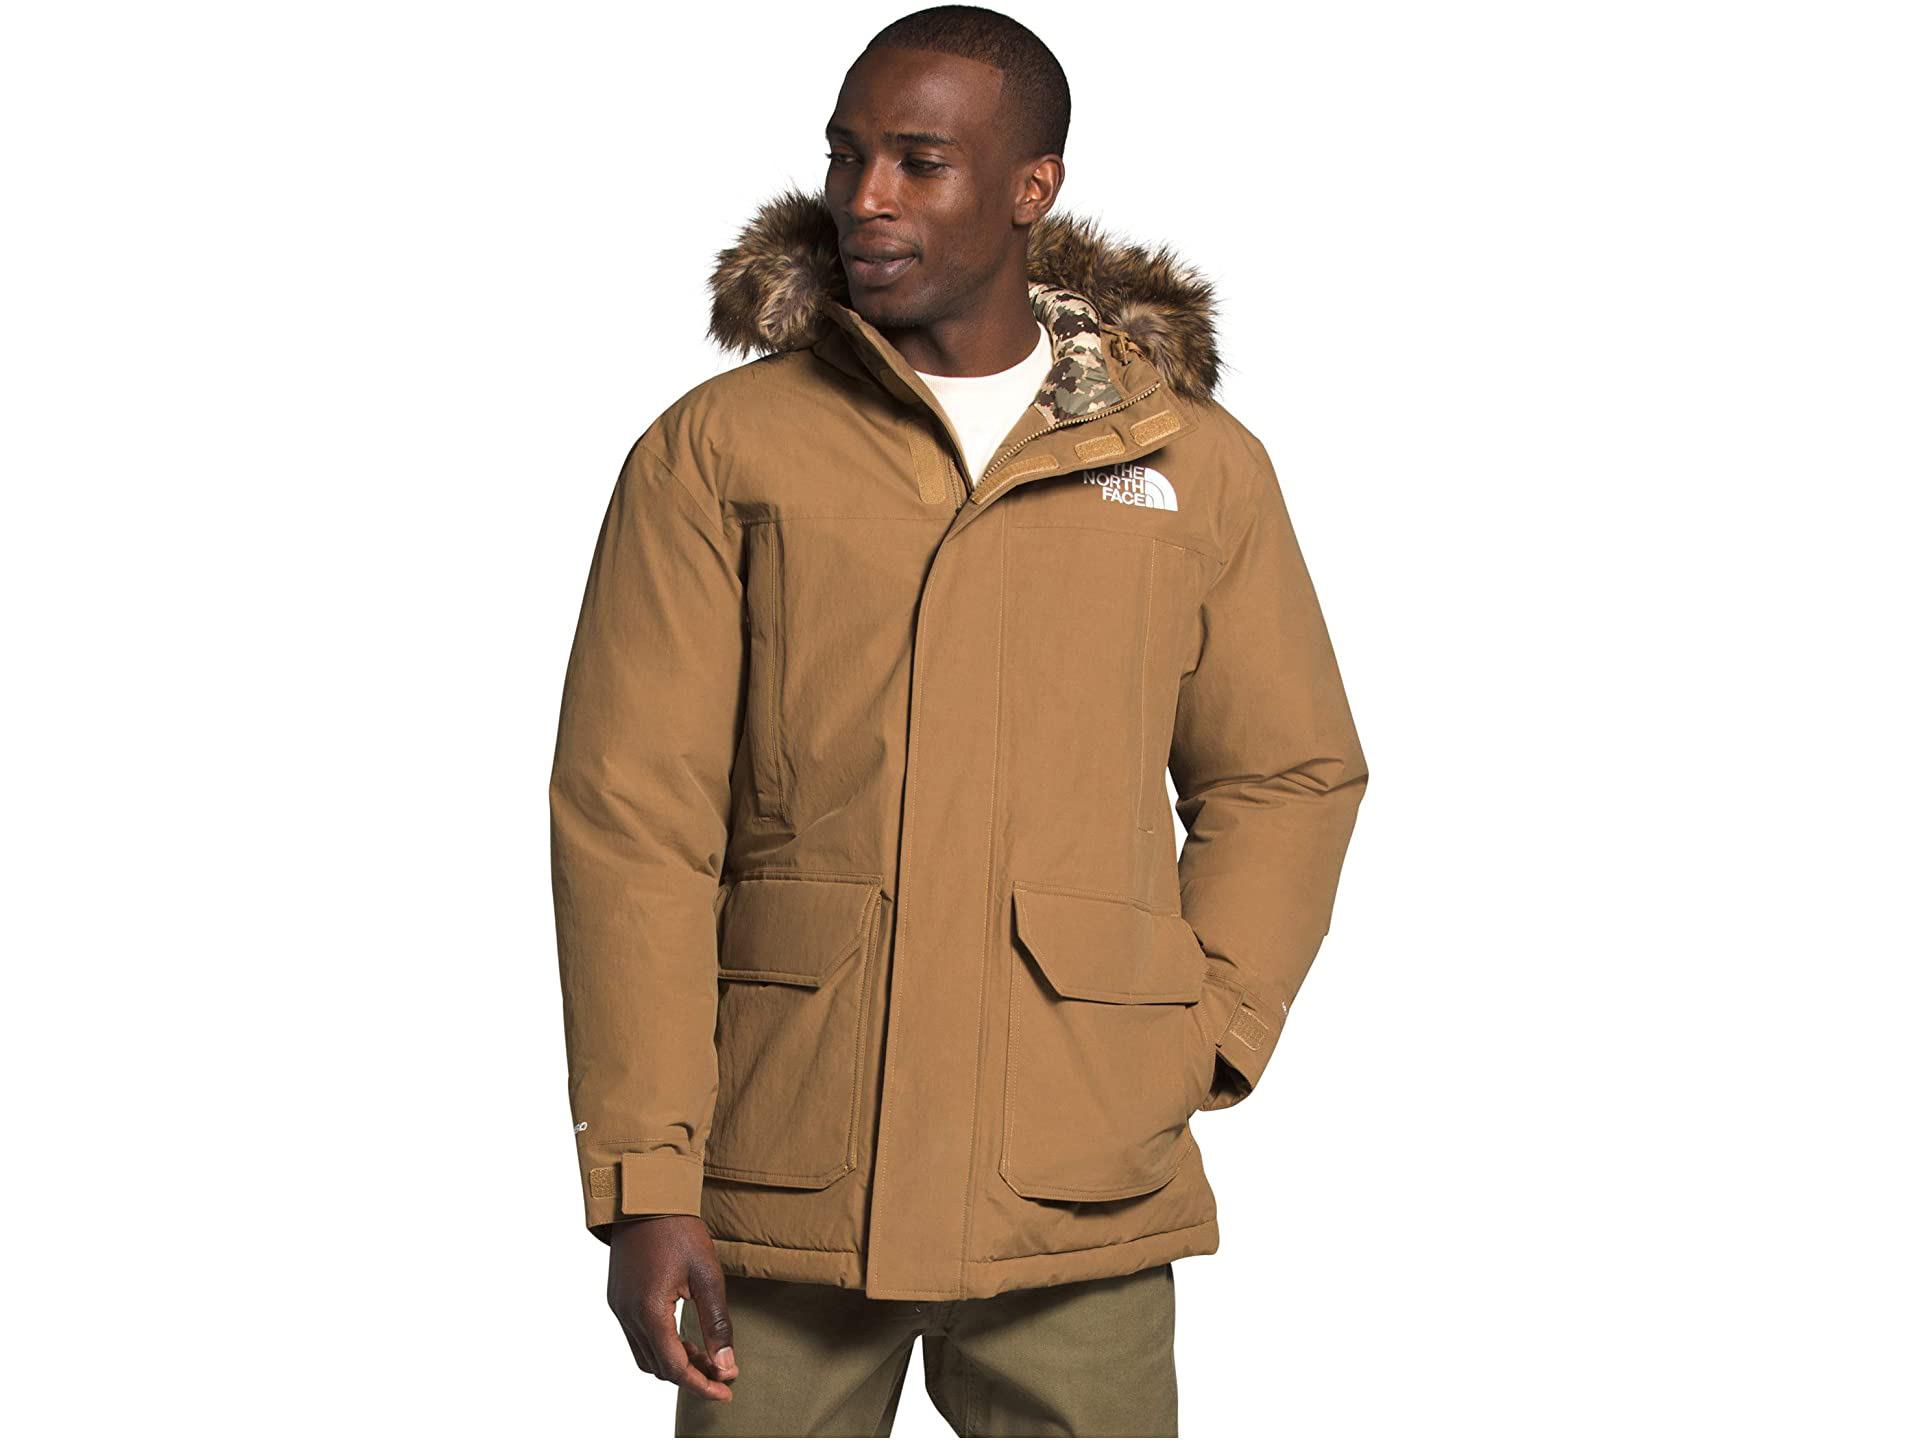 Best Men's Winter Jackets - The North Face McMurdo Parka